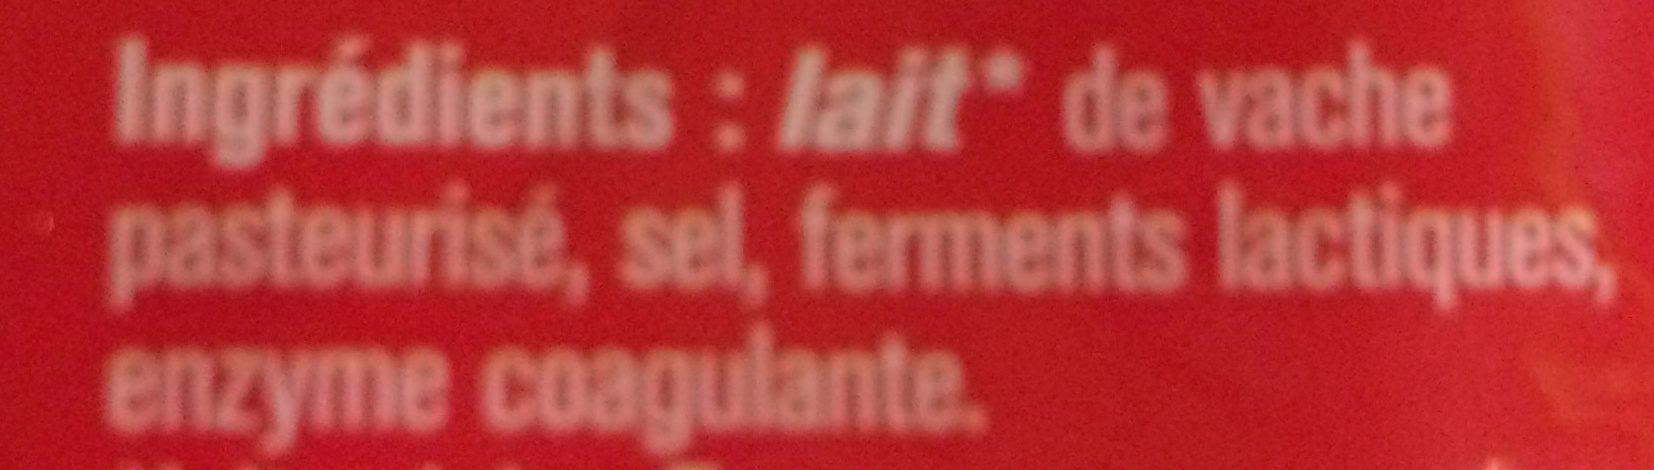 Emmental francais - Ingredients